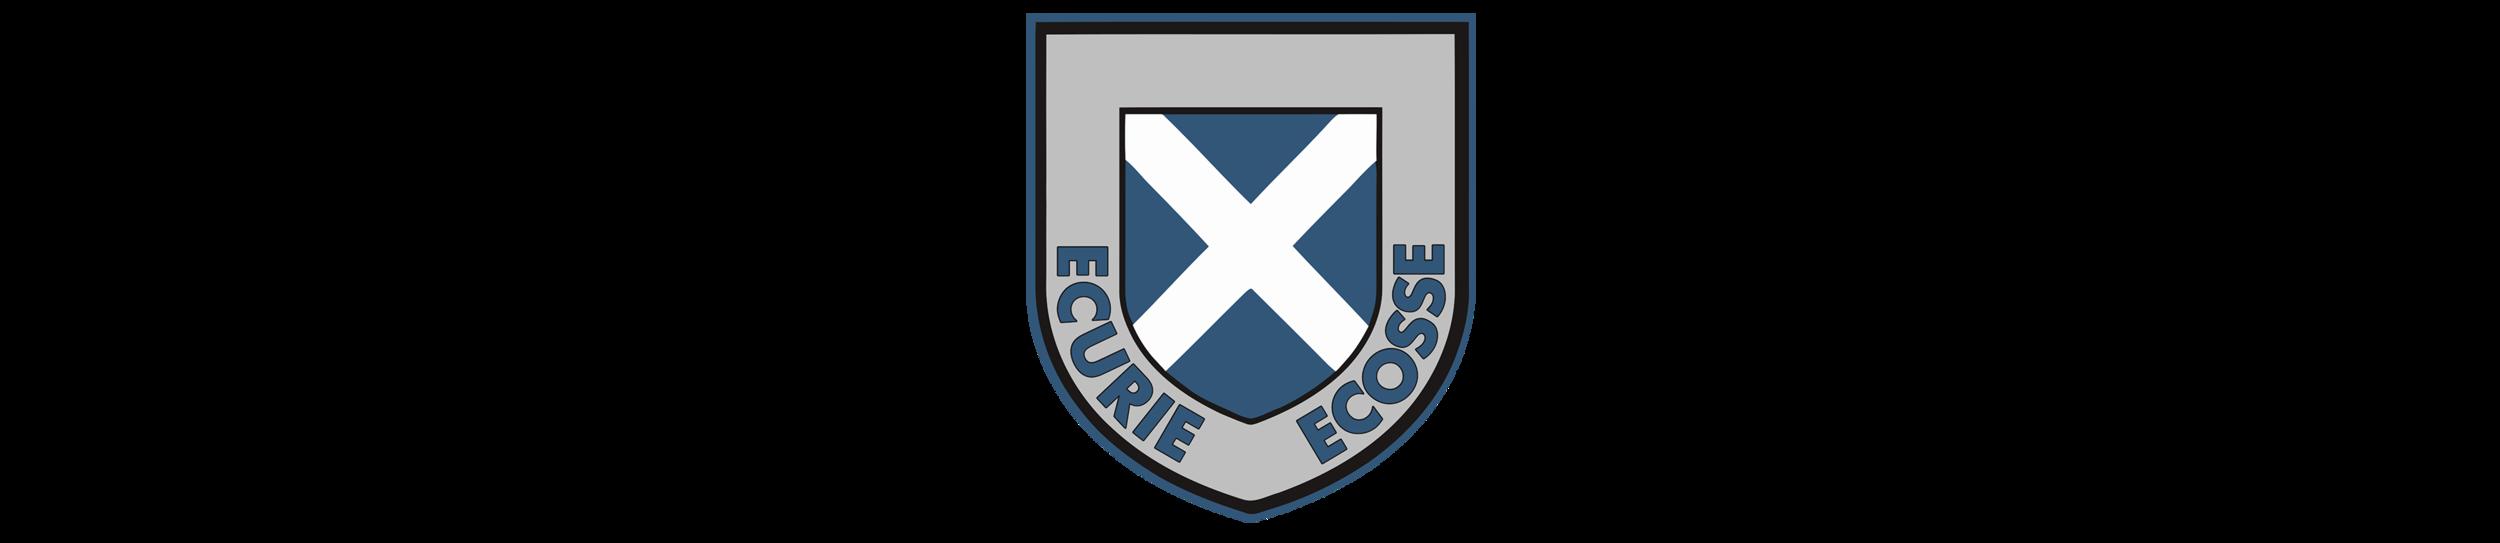 Ecurie Ecosse Logo.png